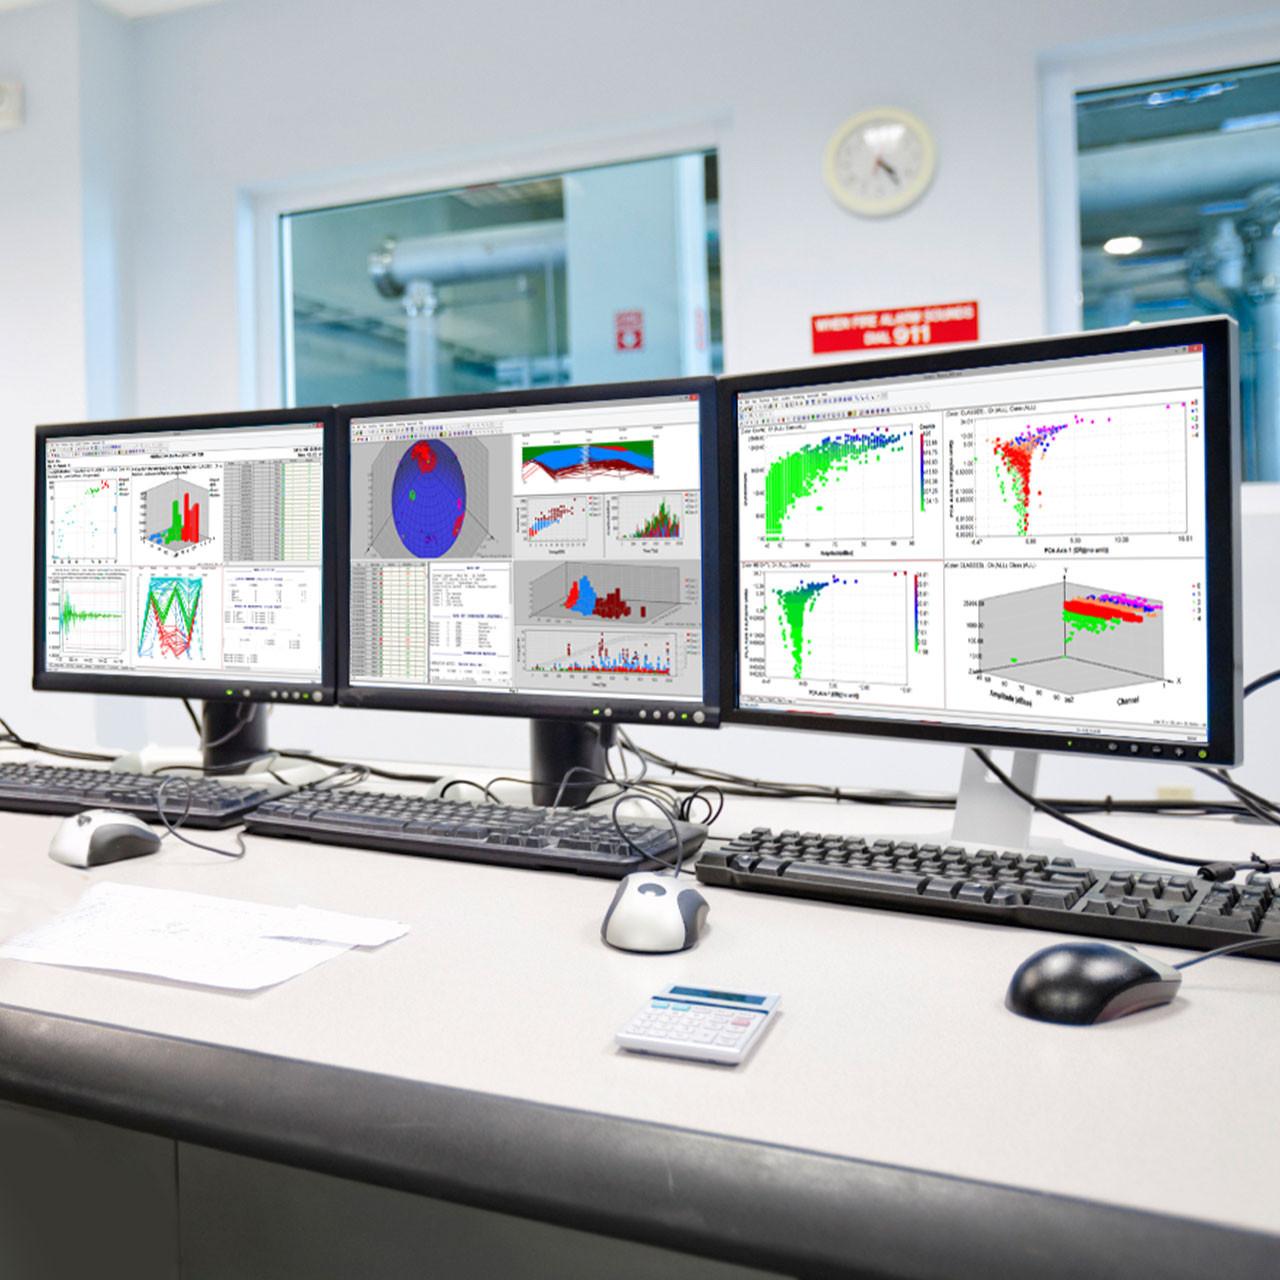 NOESIS™ – Advanced Data Analysis Pattern Recognition